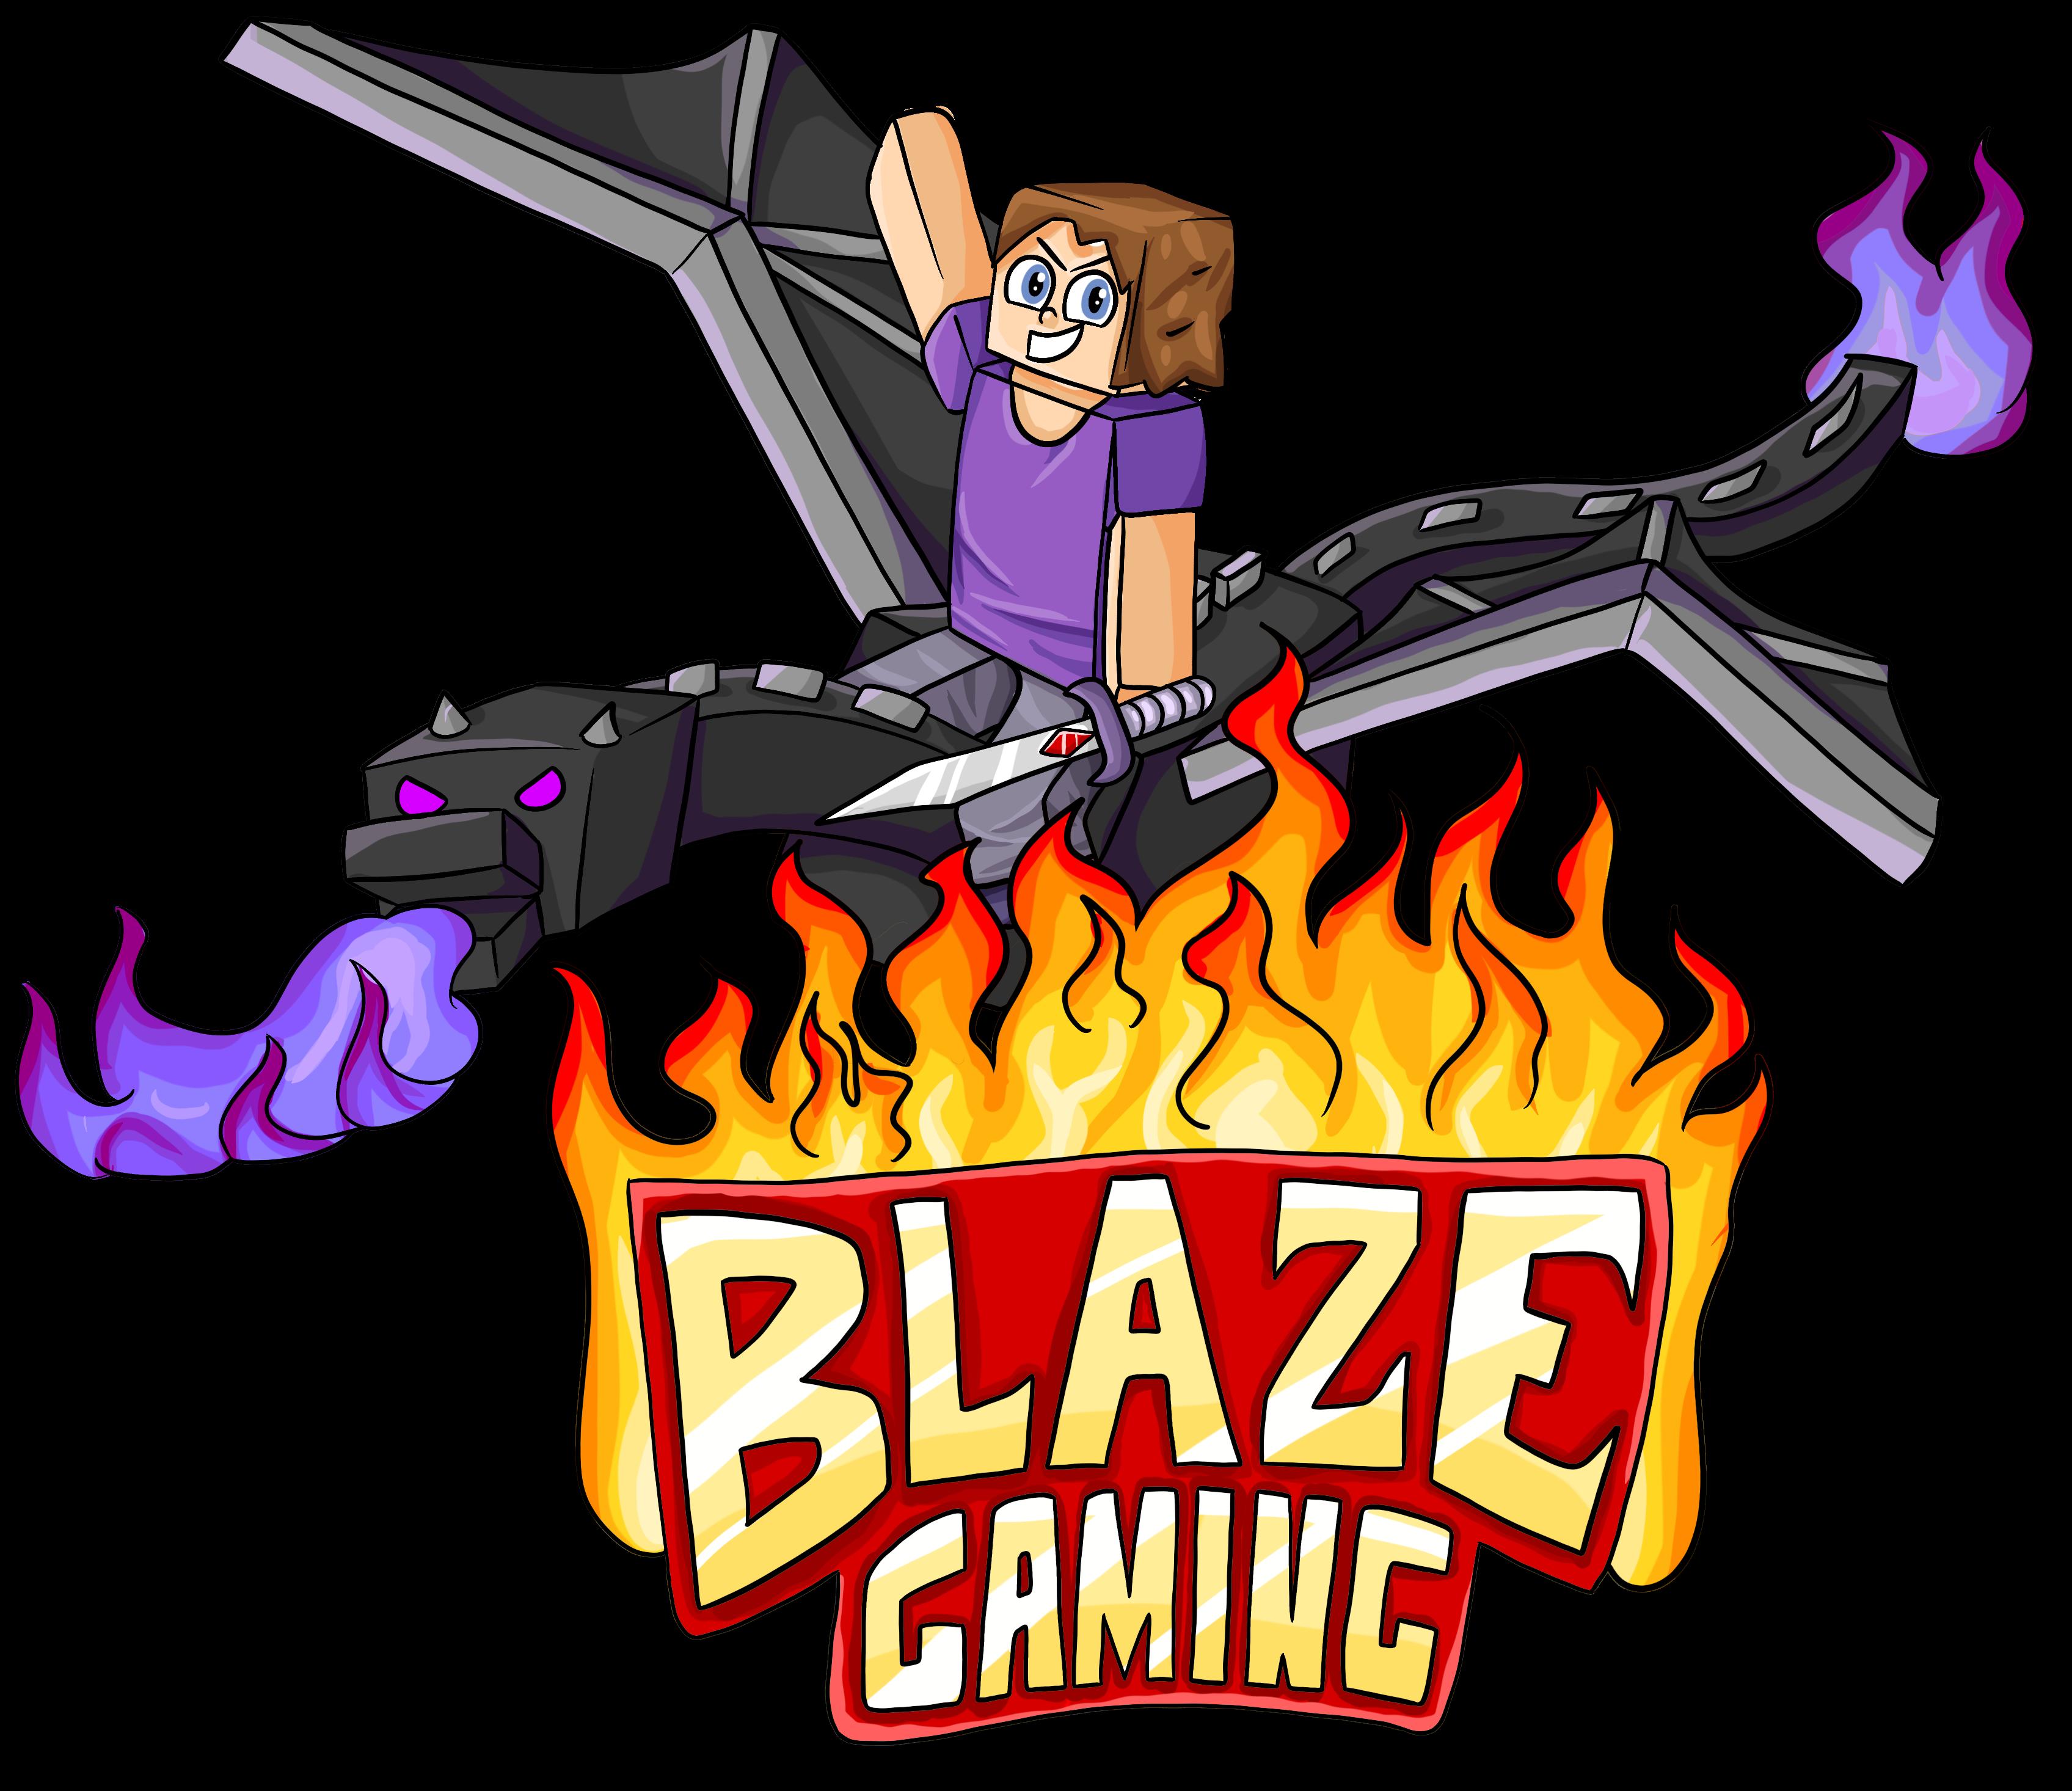 Blaze Gaming